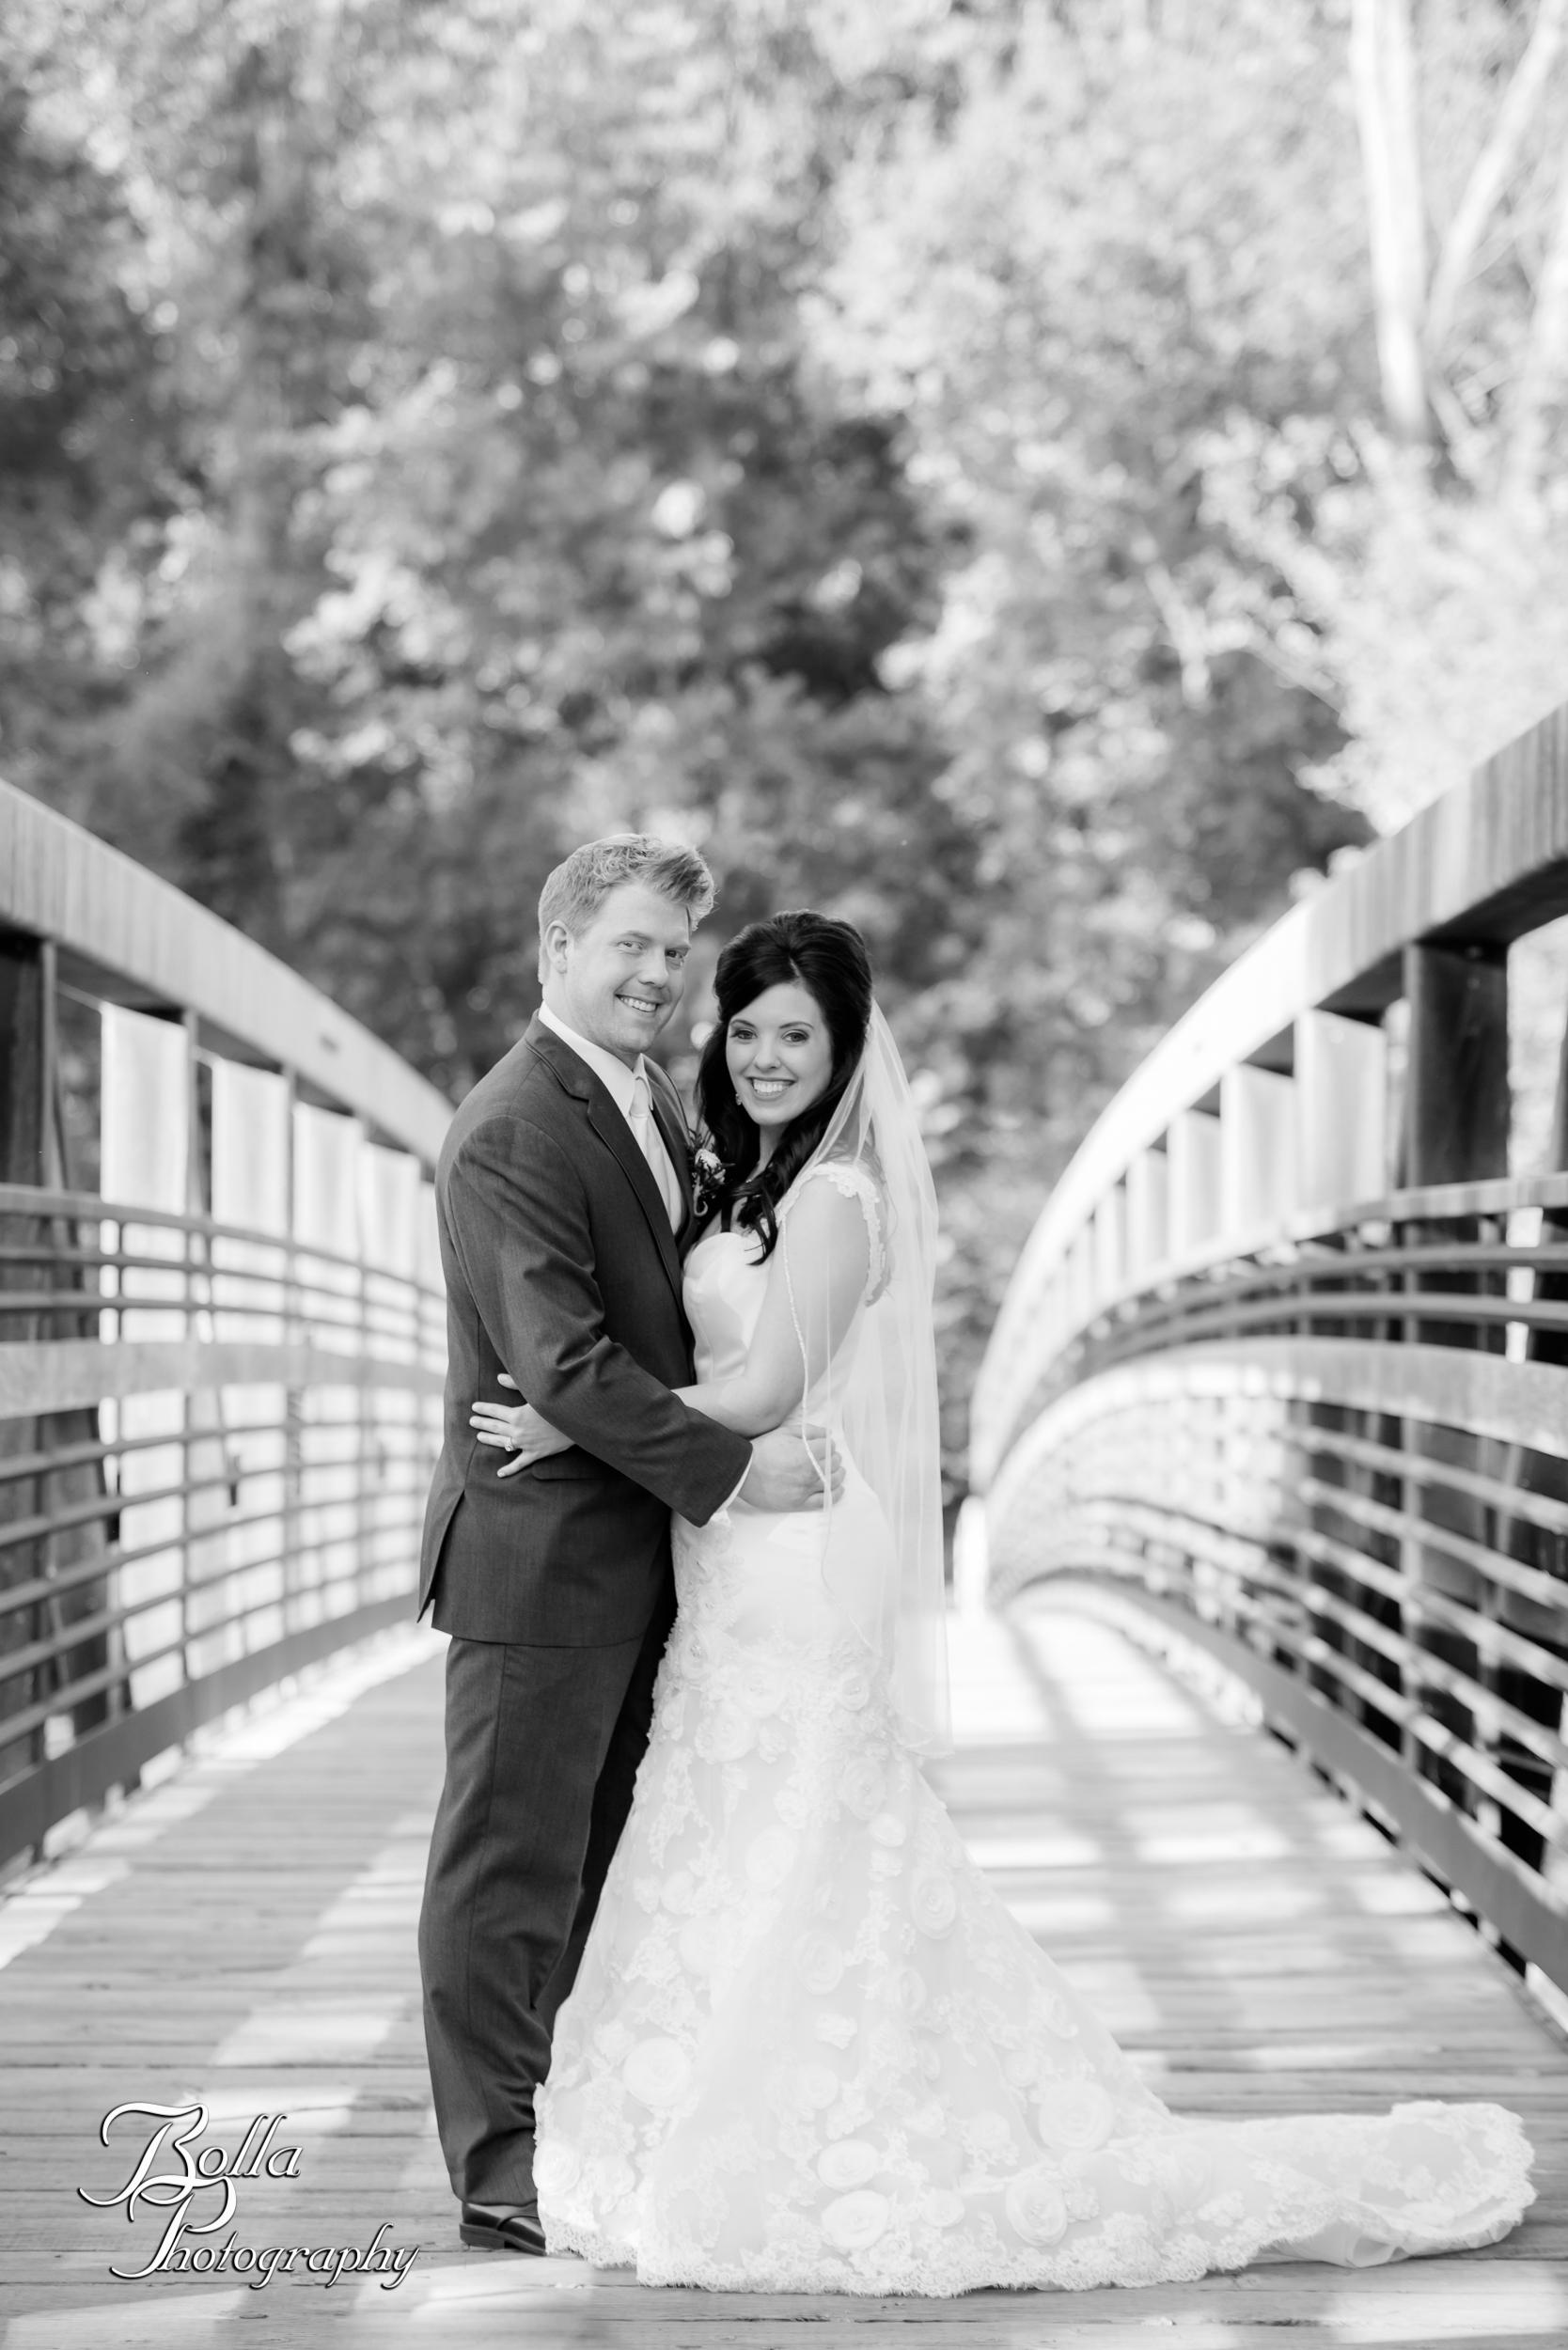 Bolla_photography_edwardsville_wedding_photographer_st_louis_weddings_Reilmann-0413.jpg